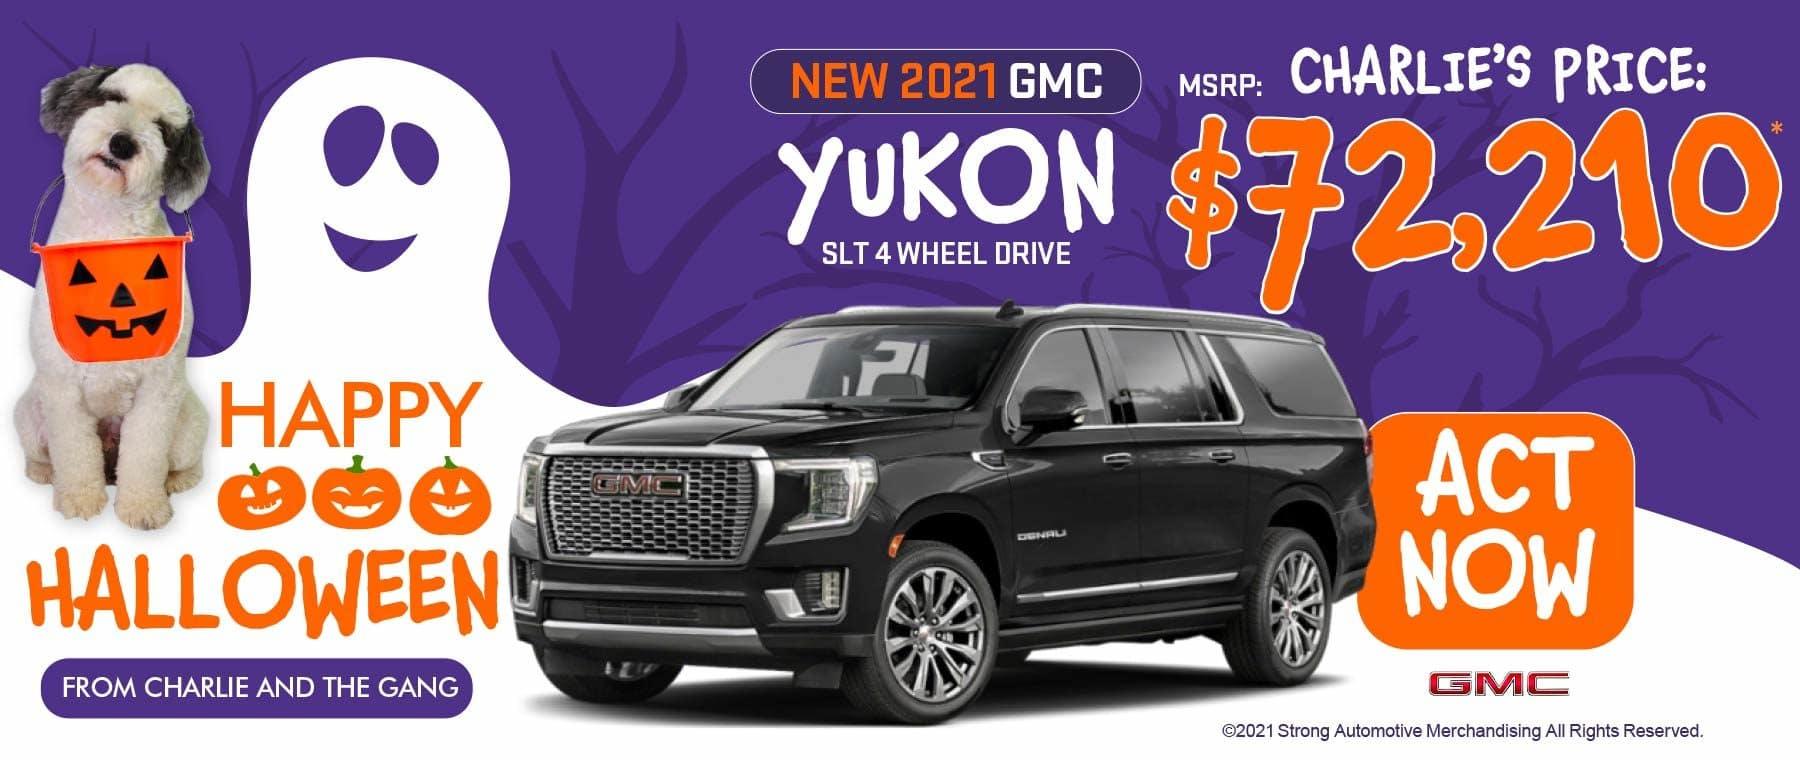 2021 GMC Yukon SLT 4WD Stk#G2696 MSRP: $72,210 ACT NOW